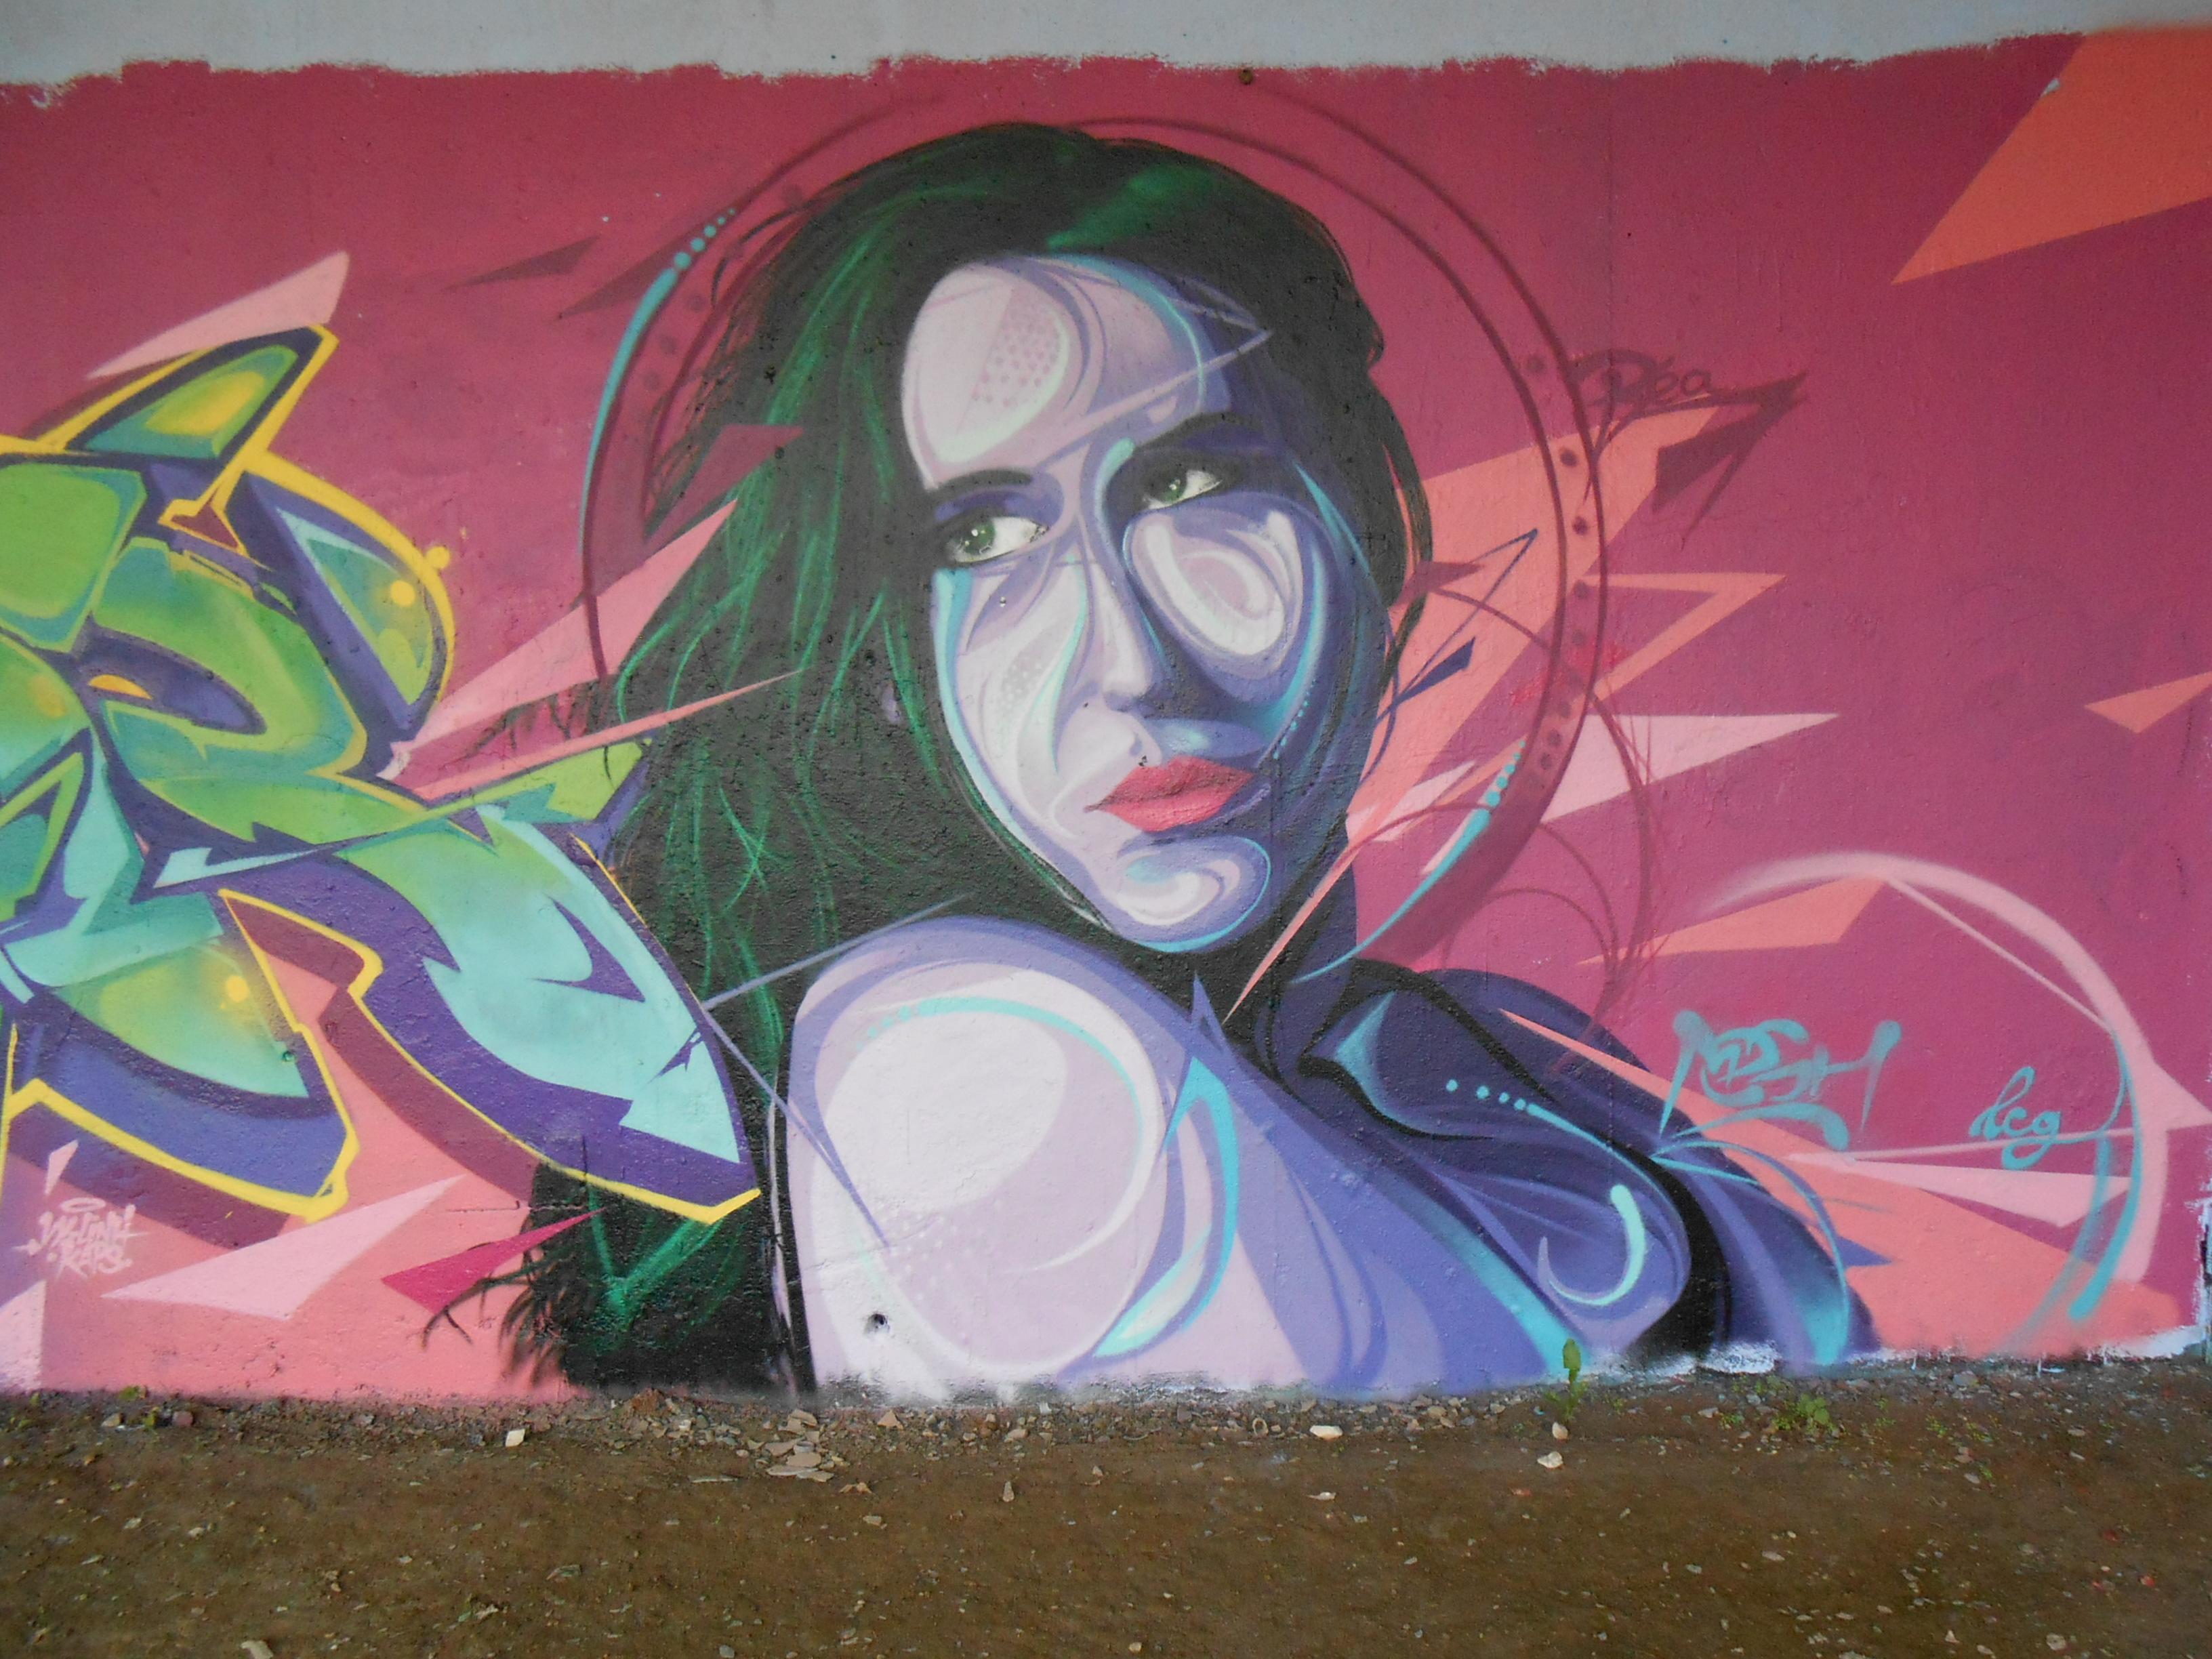 Basik, Wyker, Mesh-graffiti-besancon-juill2014 (4)